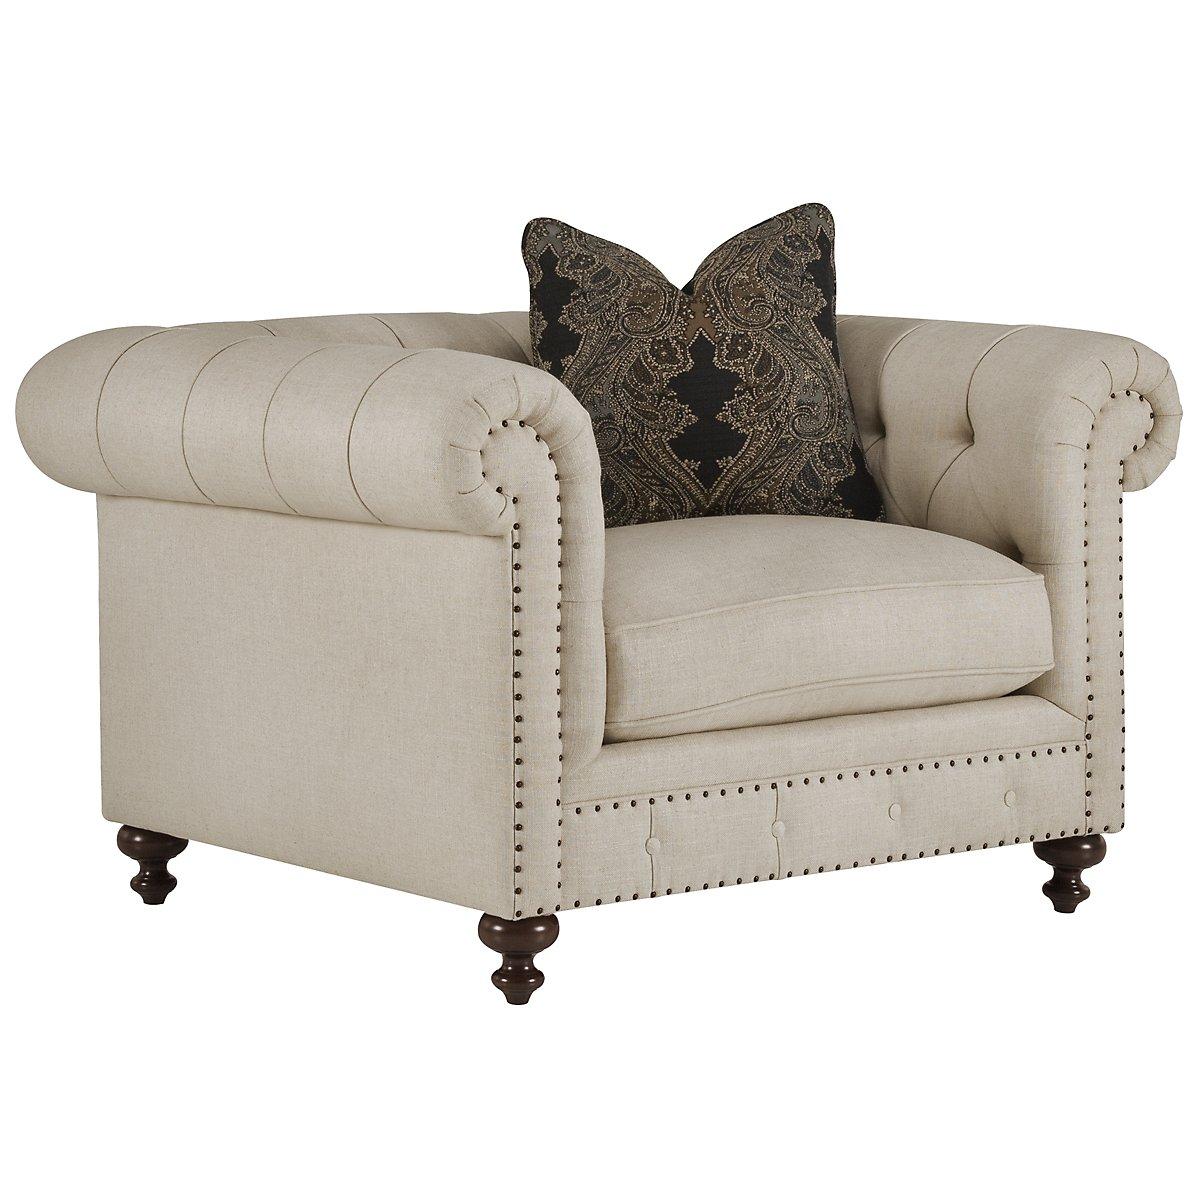 Riviera Light Beige Fabric Chair